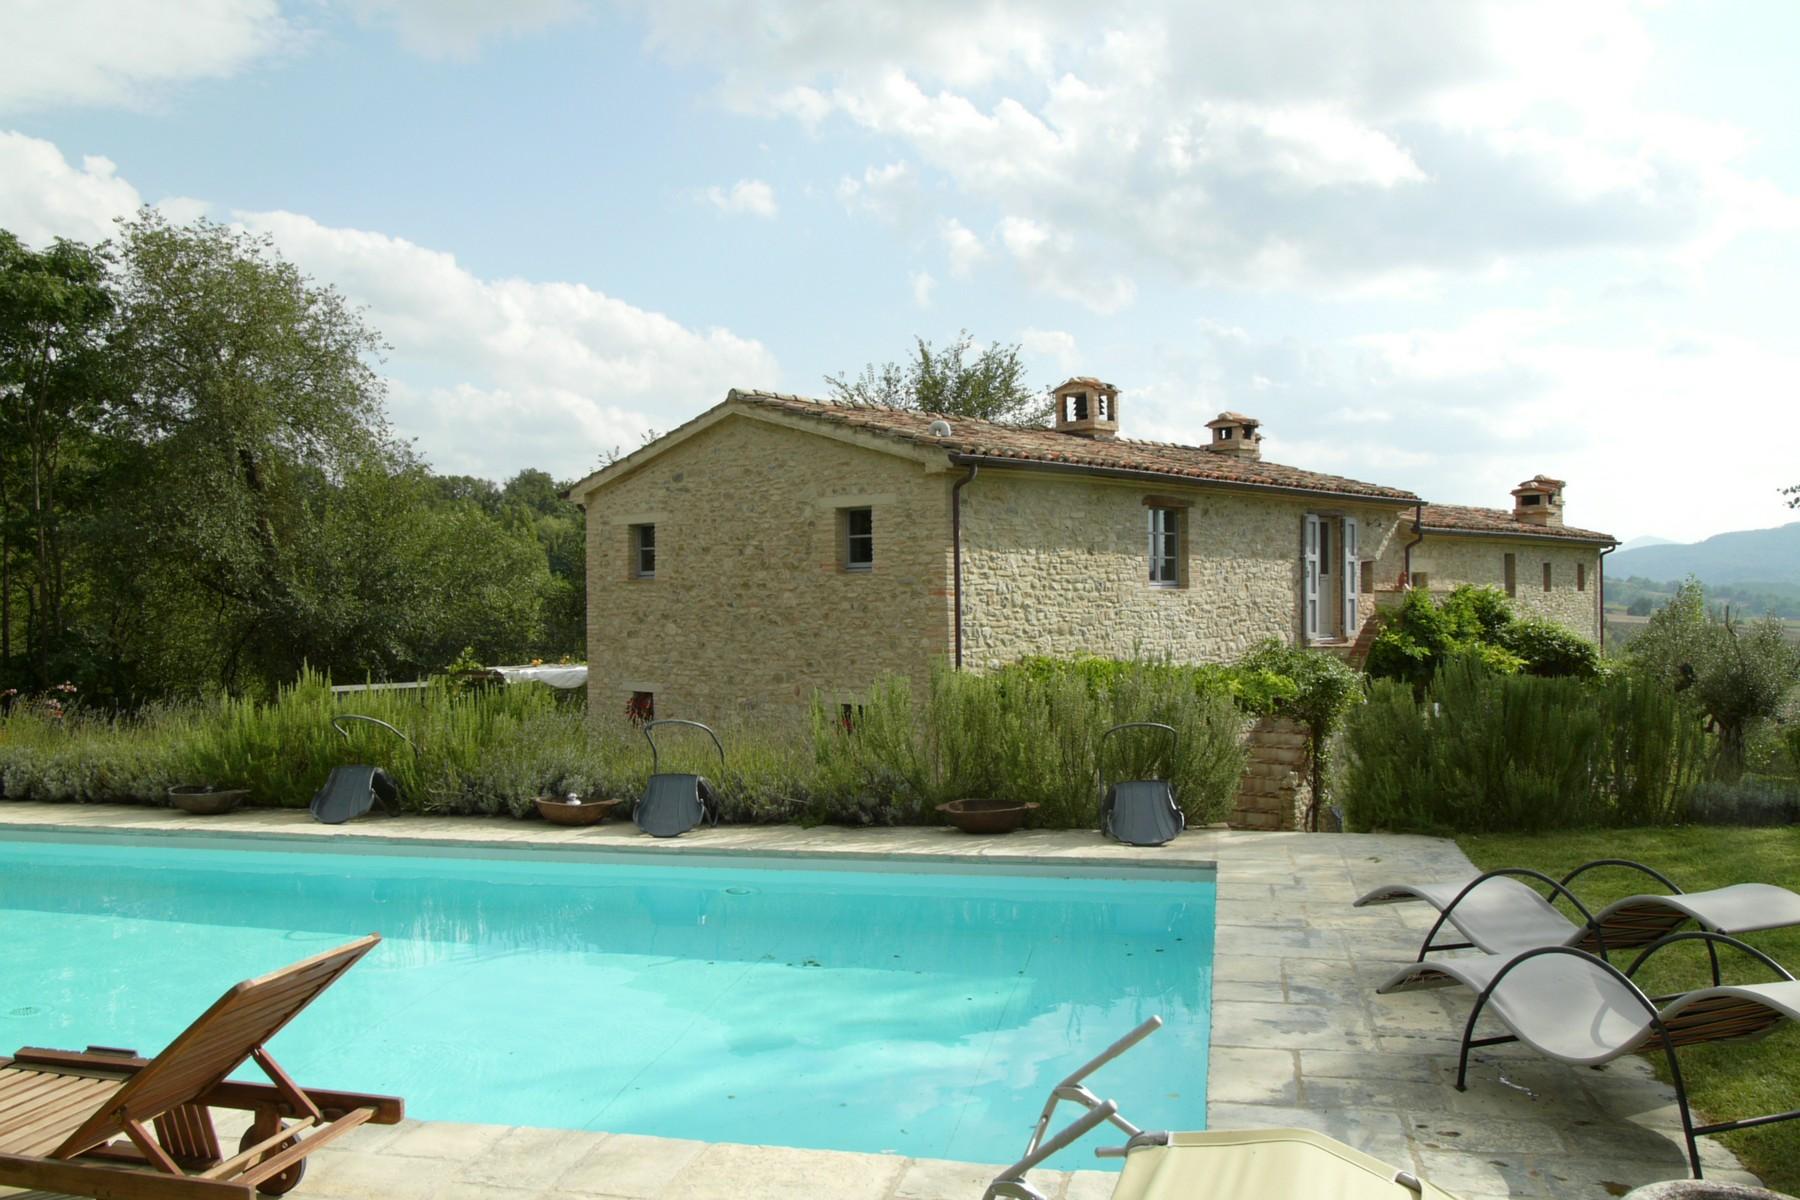 Vivienda unifamiliar por un Venta en Stone farmhouse with stunning views Voc. Caibizzocco Montone, Perugia 06014 Italia